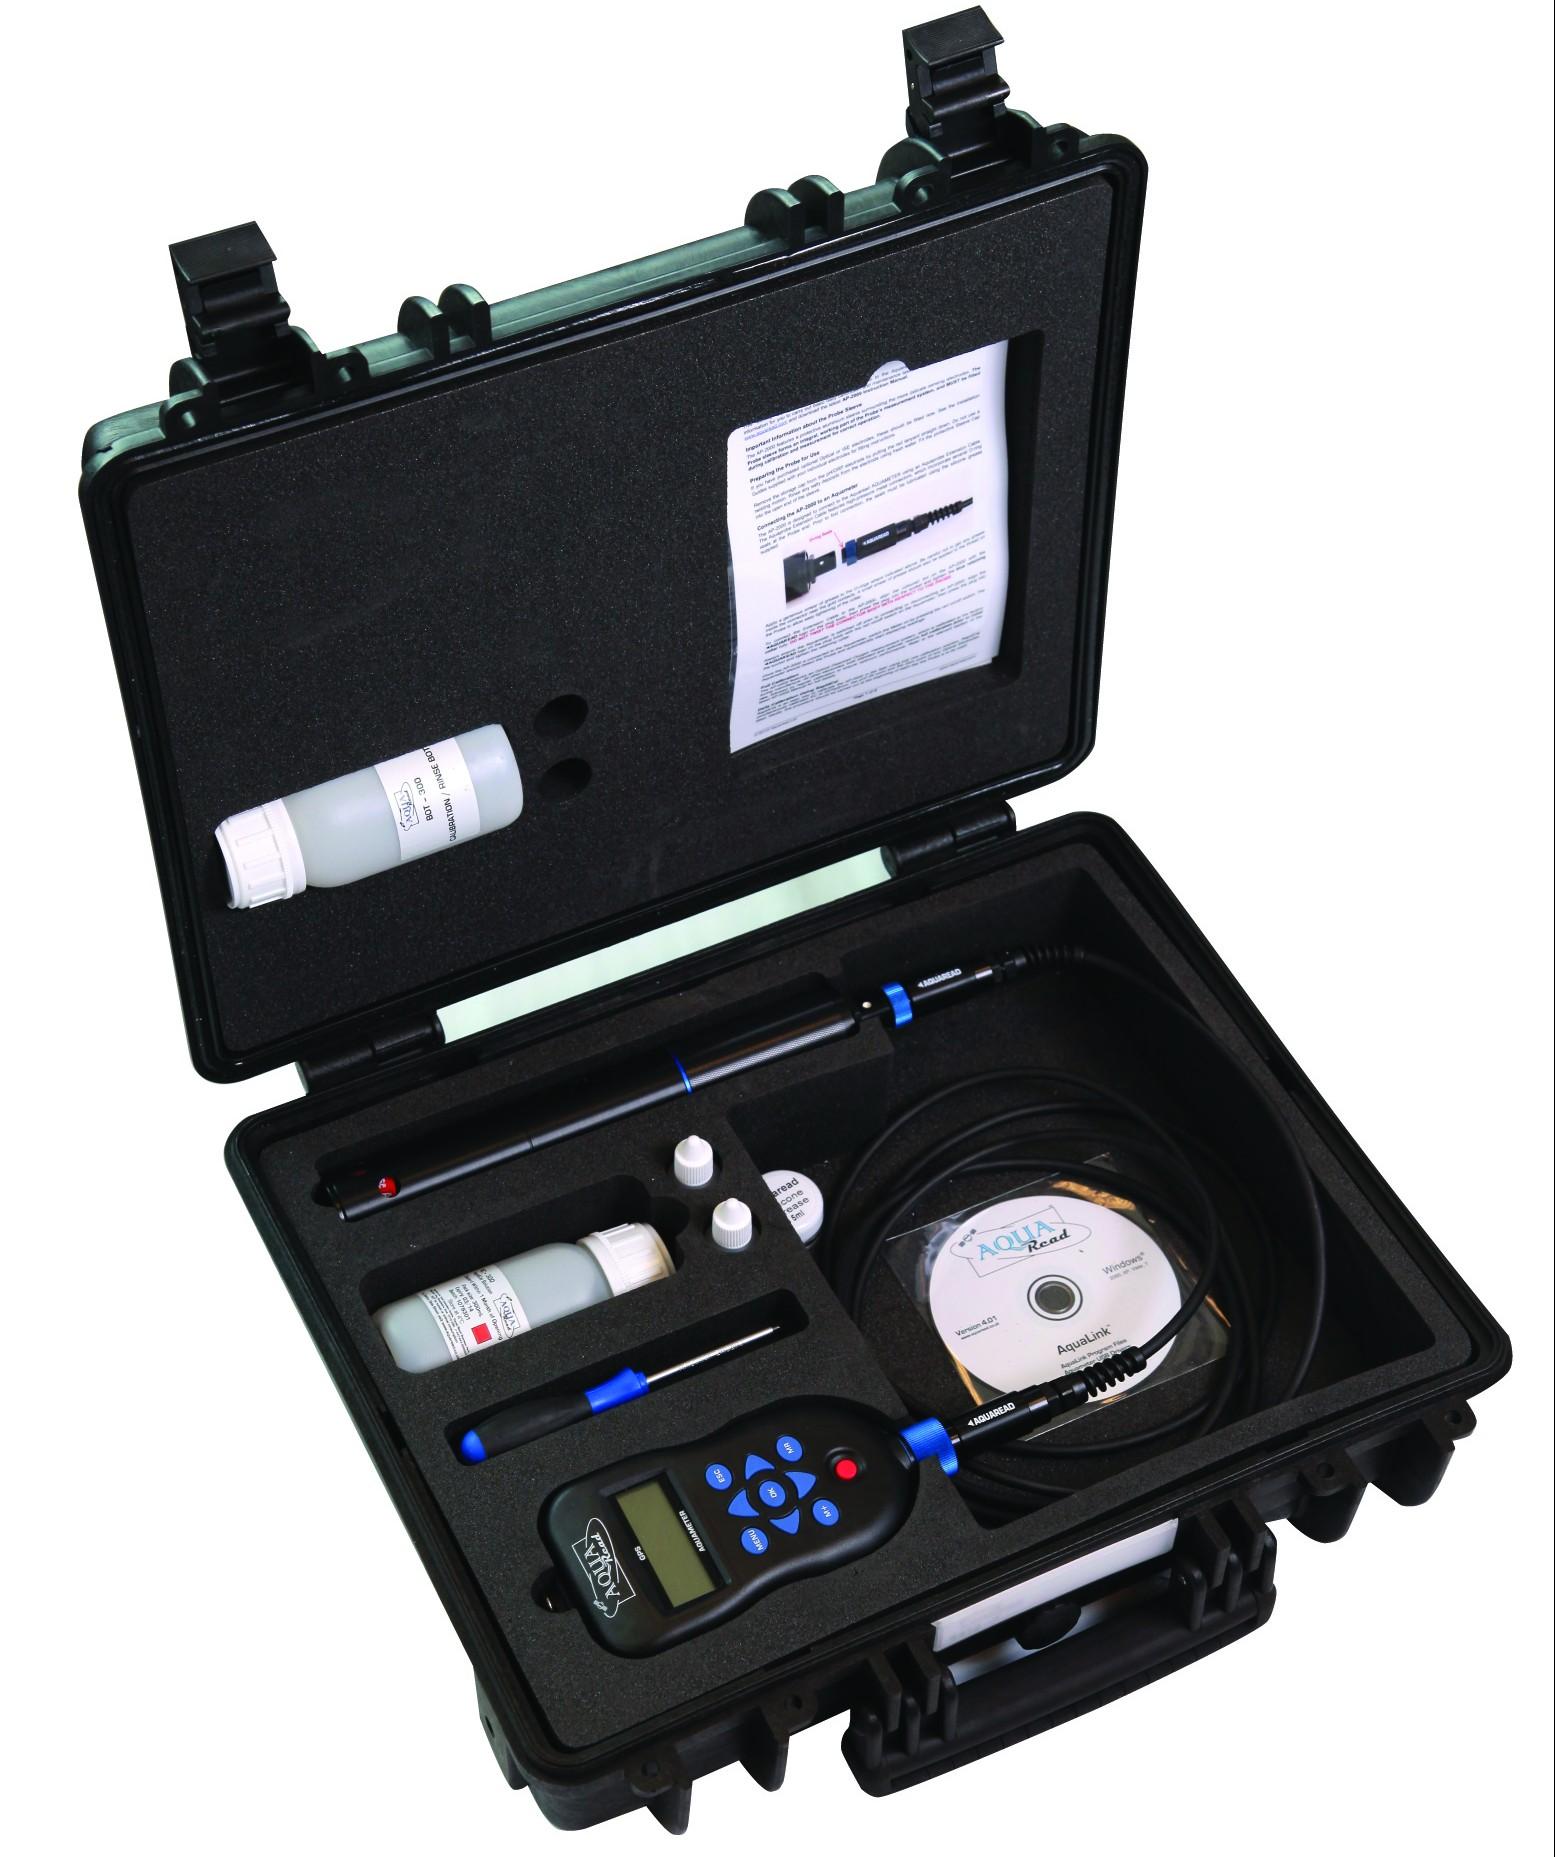 ap-2000-package-e1423751806533